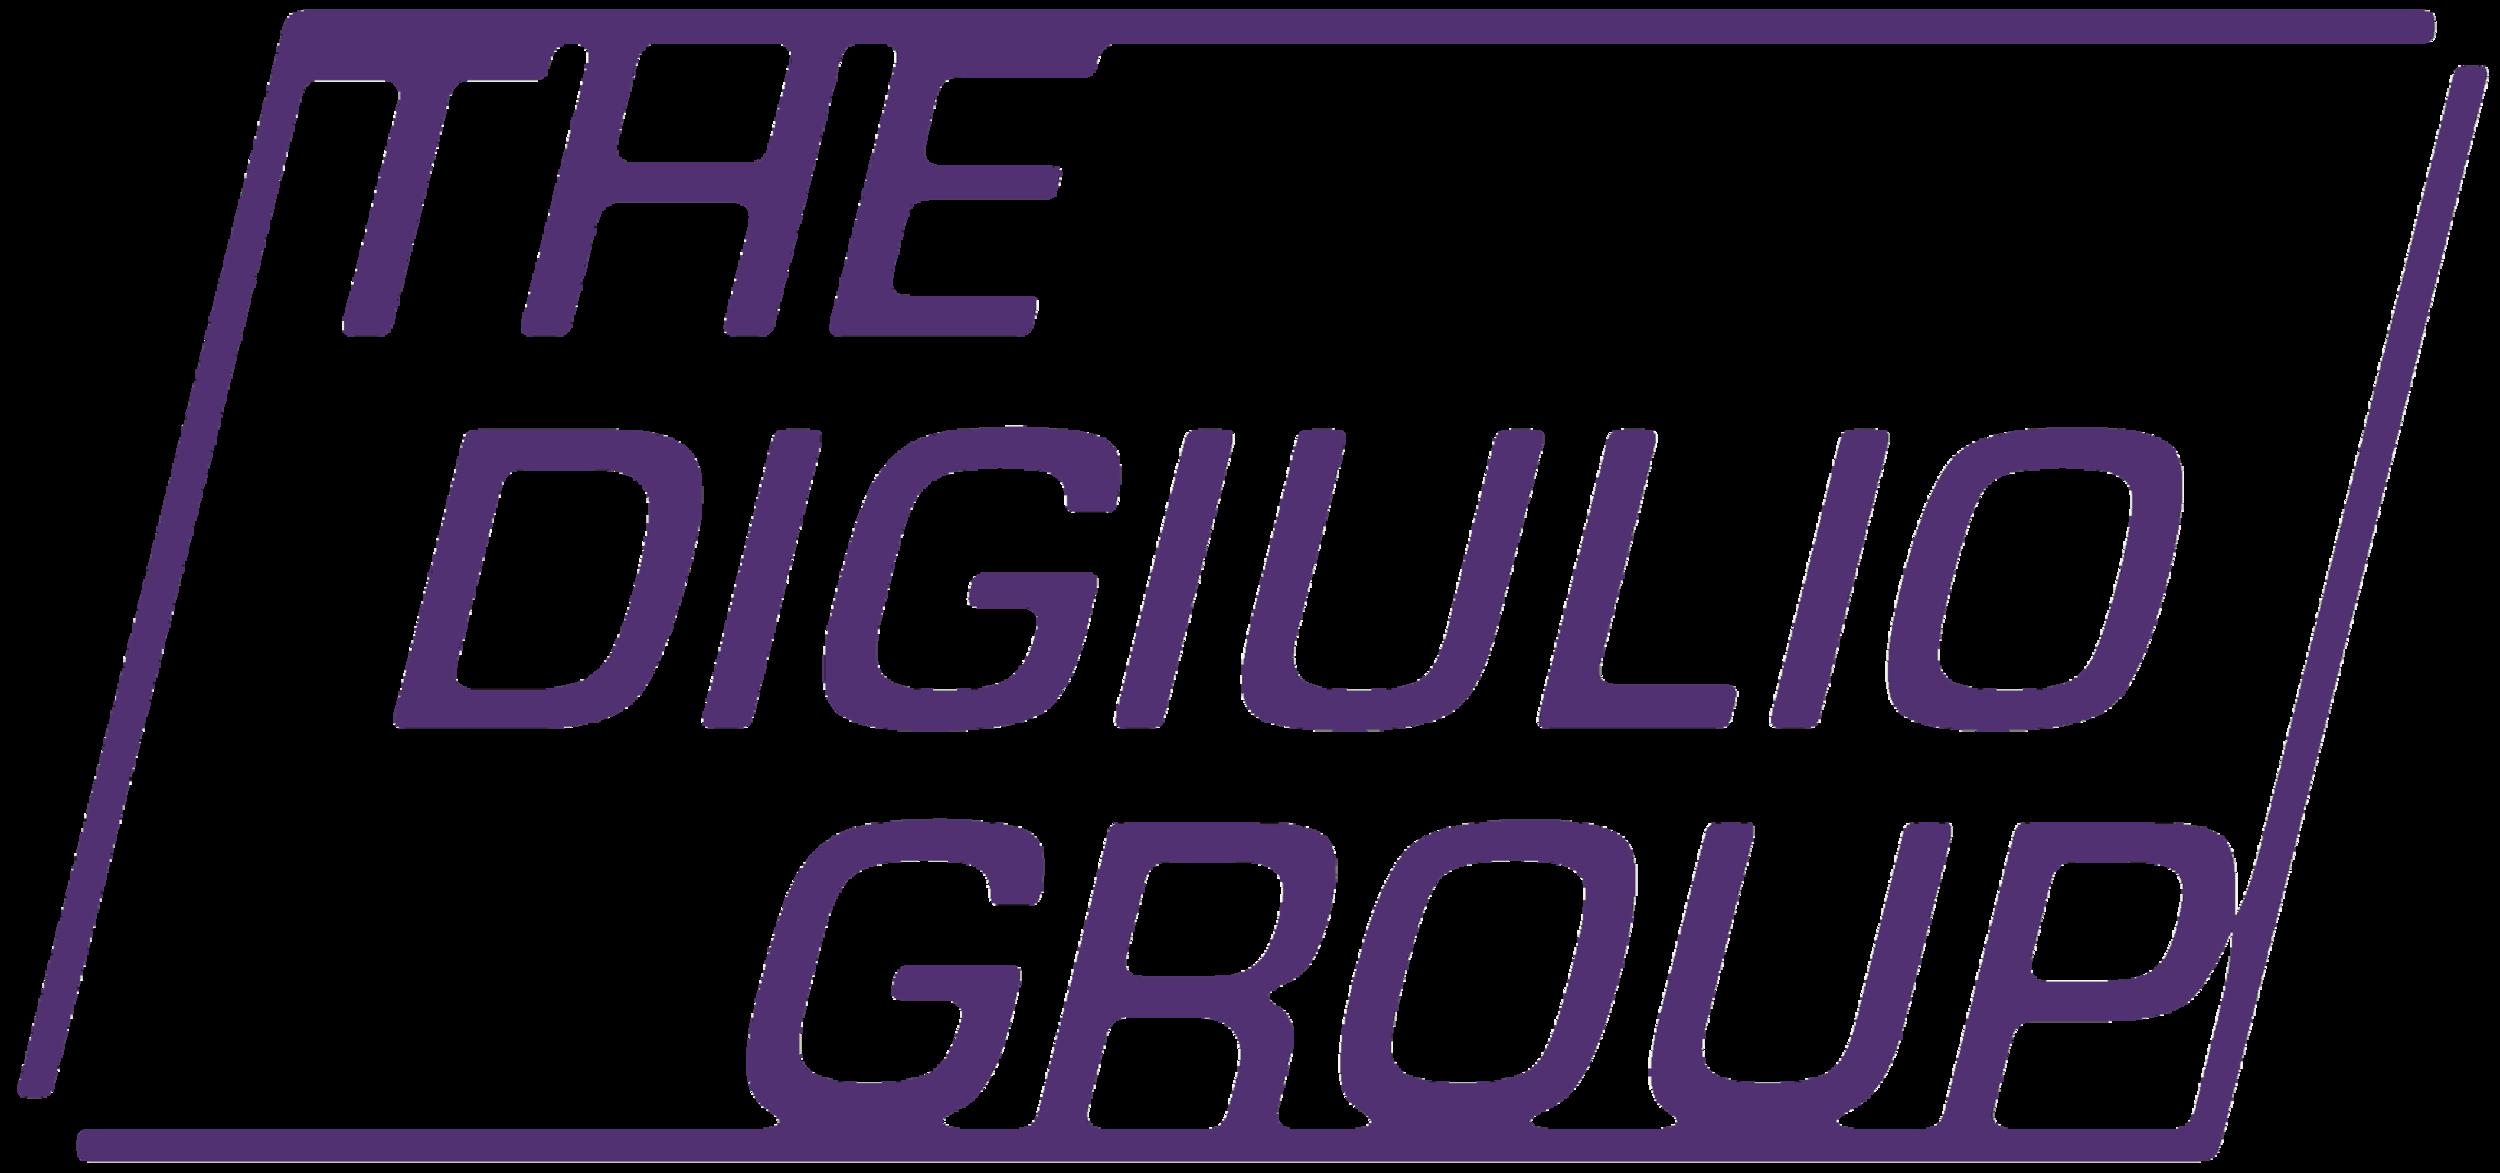 DiGiulio Group Purple LOGO.png